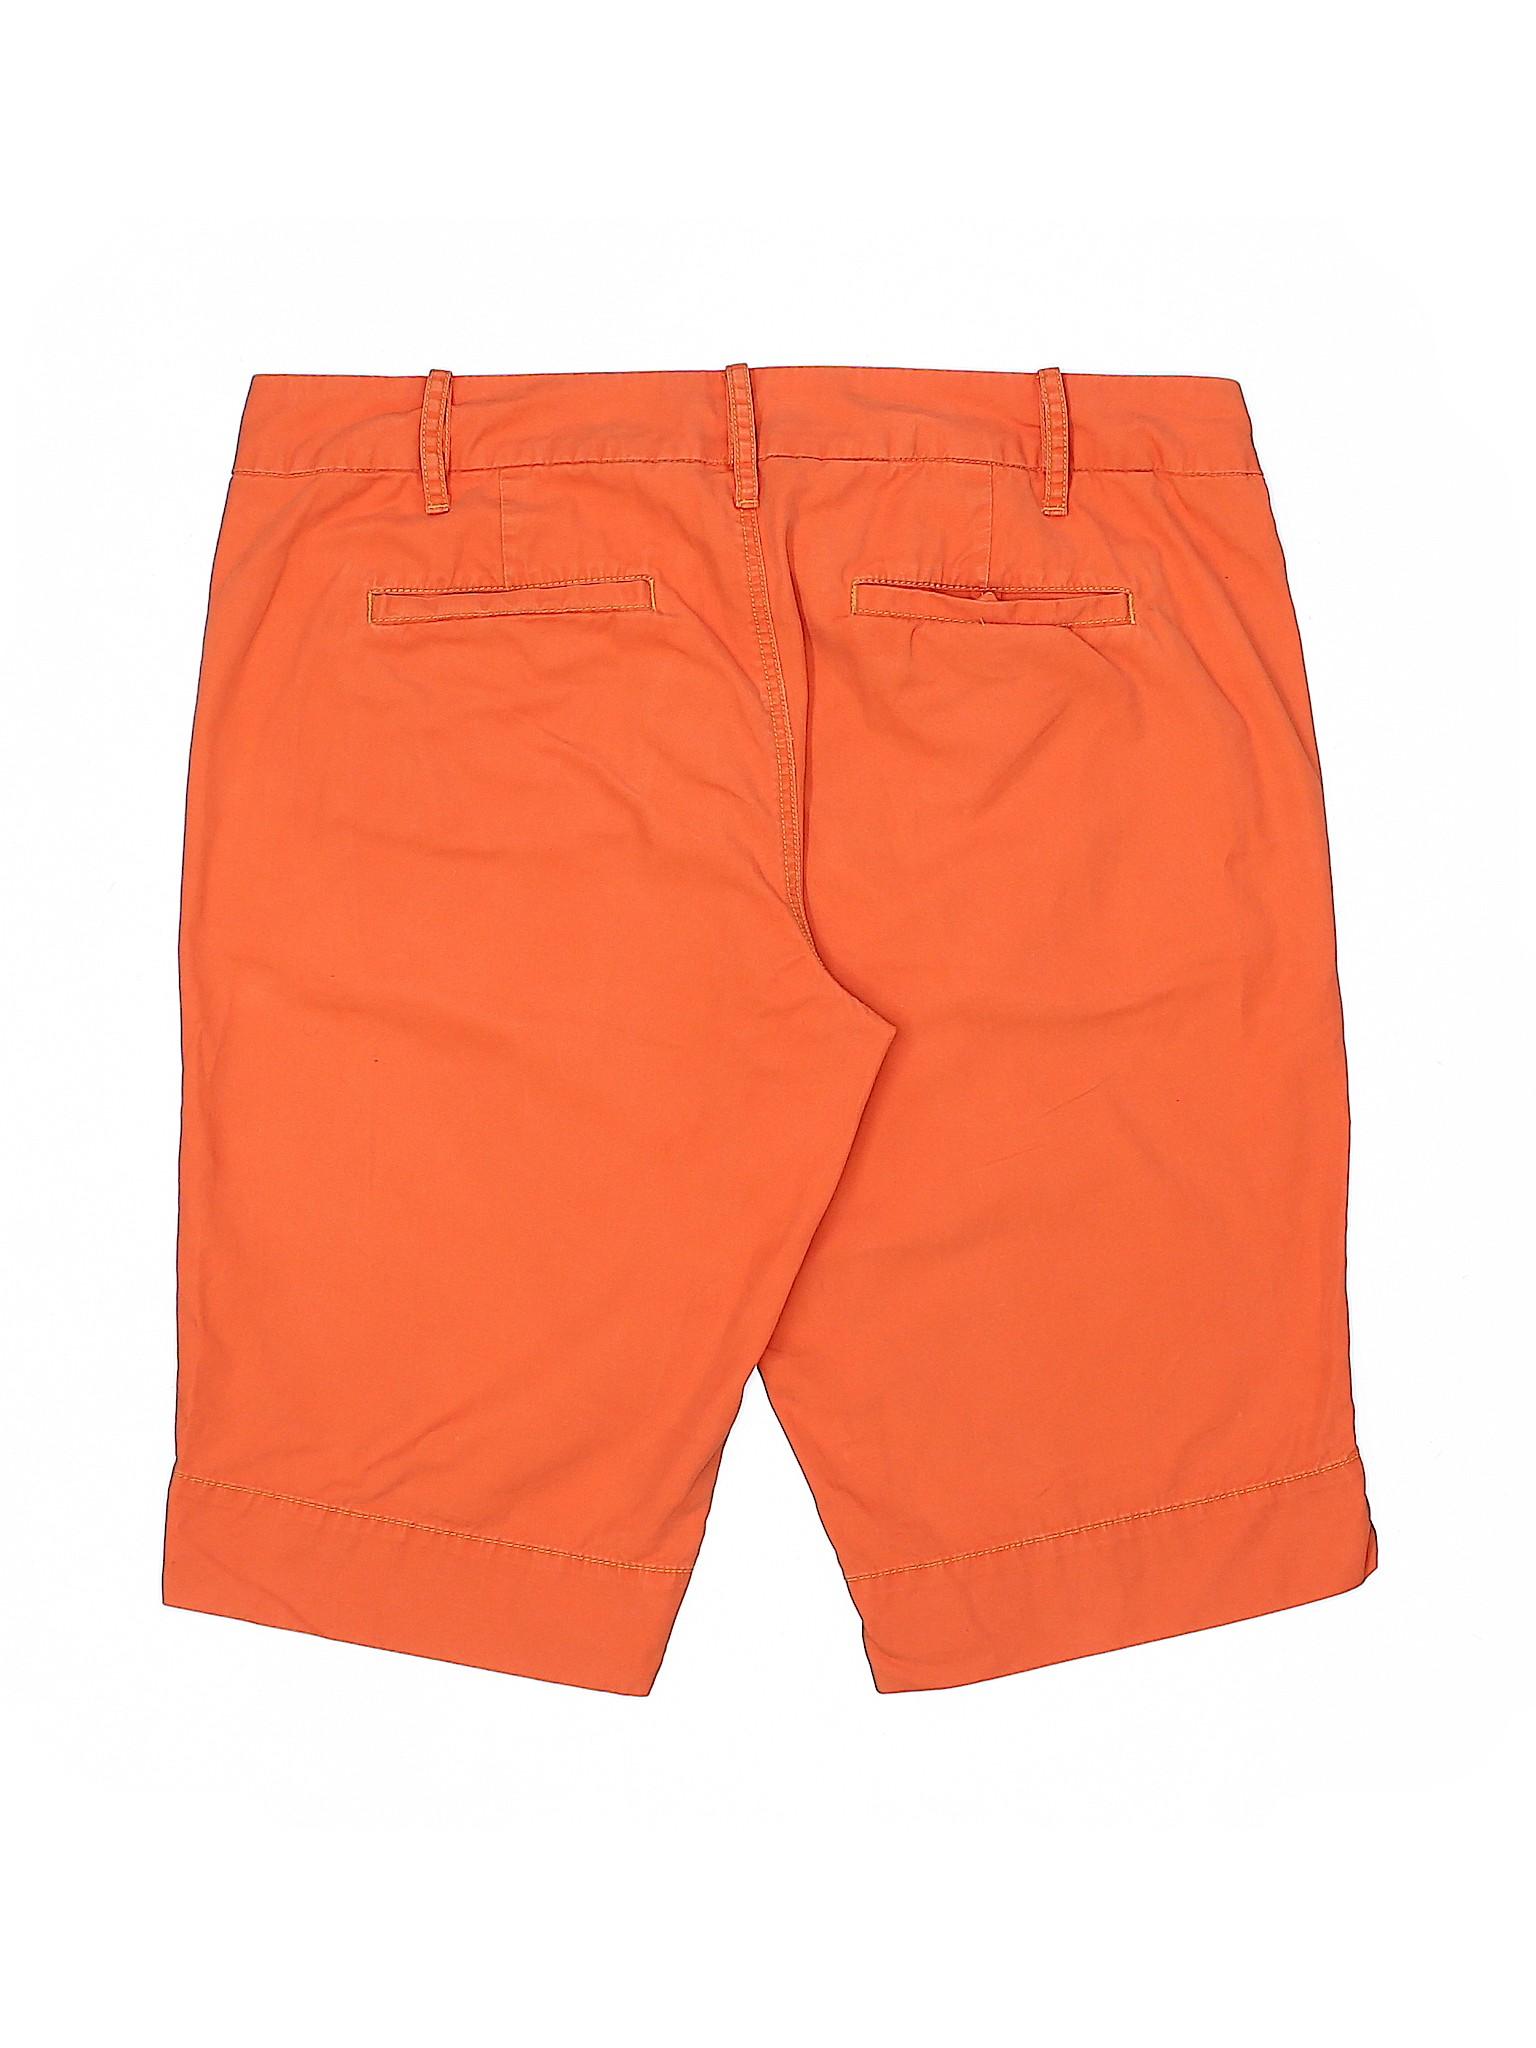 Boutique Boutique Khaki Shorts Boutique Shorts Boutique G1 G1 Shorts Khaki G1 Khaki wgpUp1q